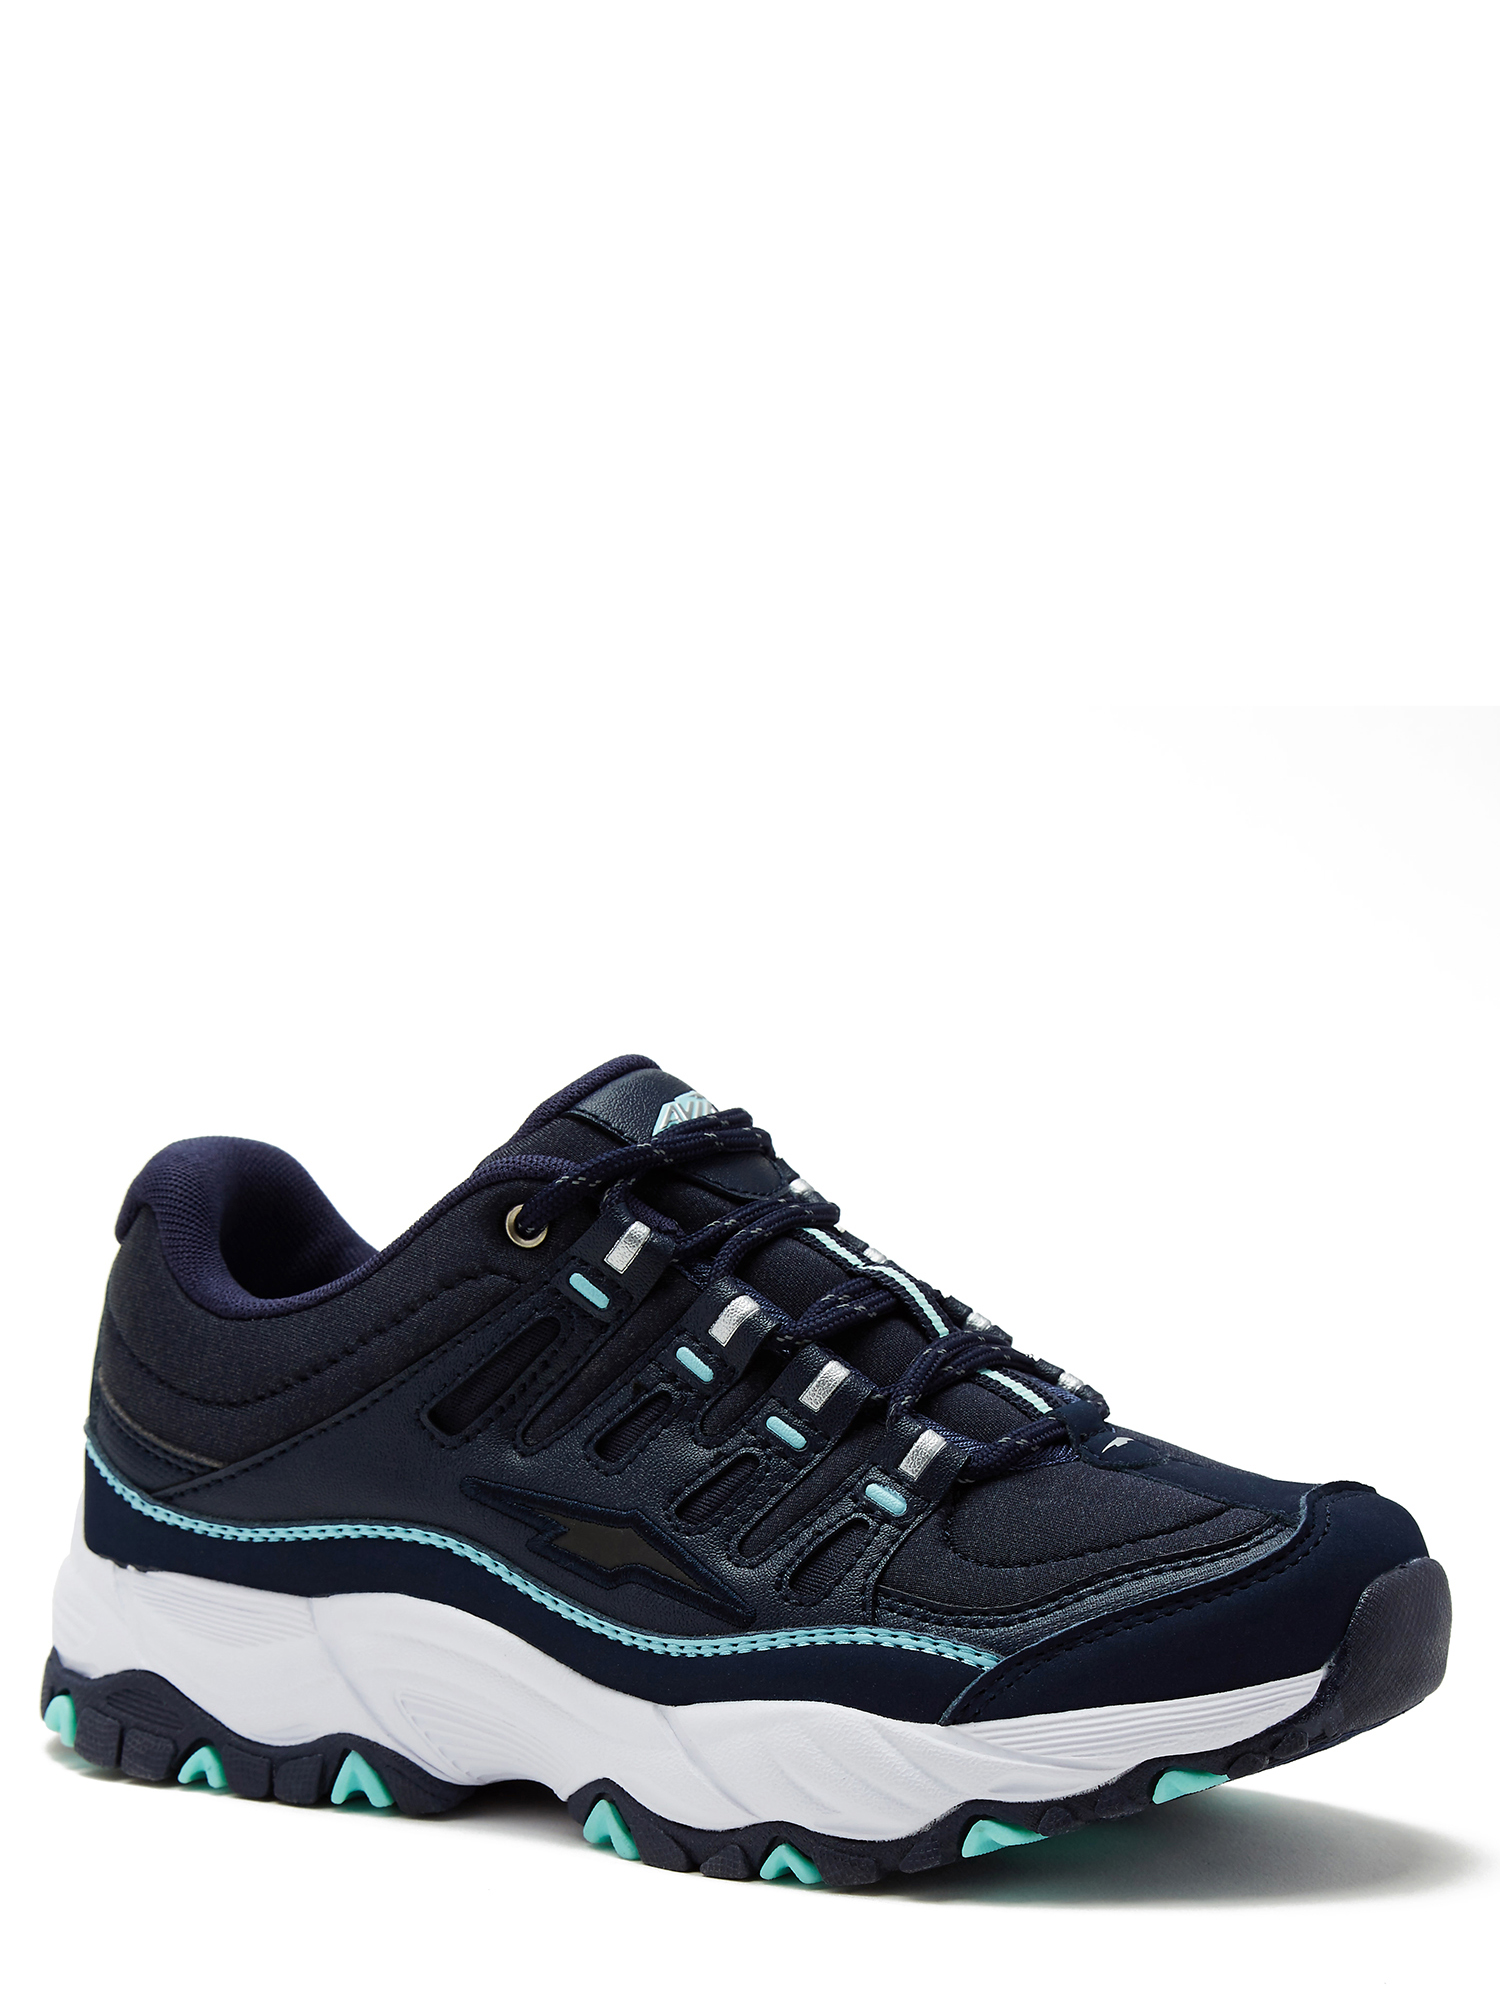 Avia - Avia Elevate Athletic Shoes